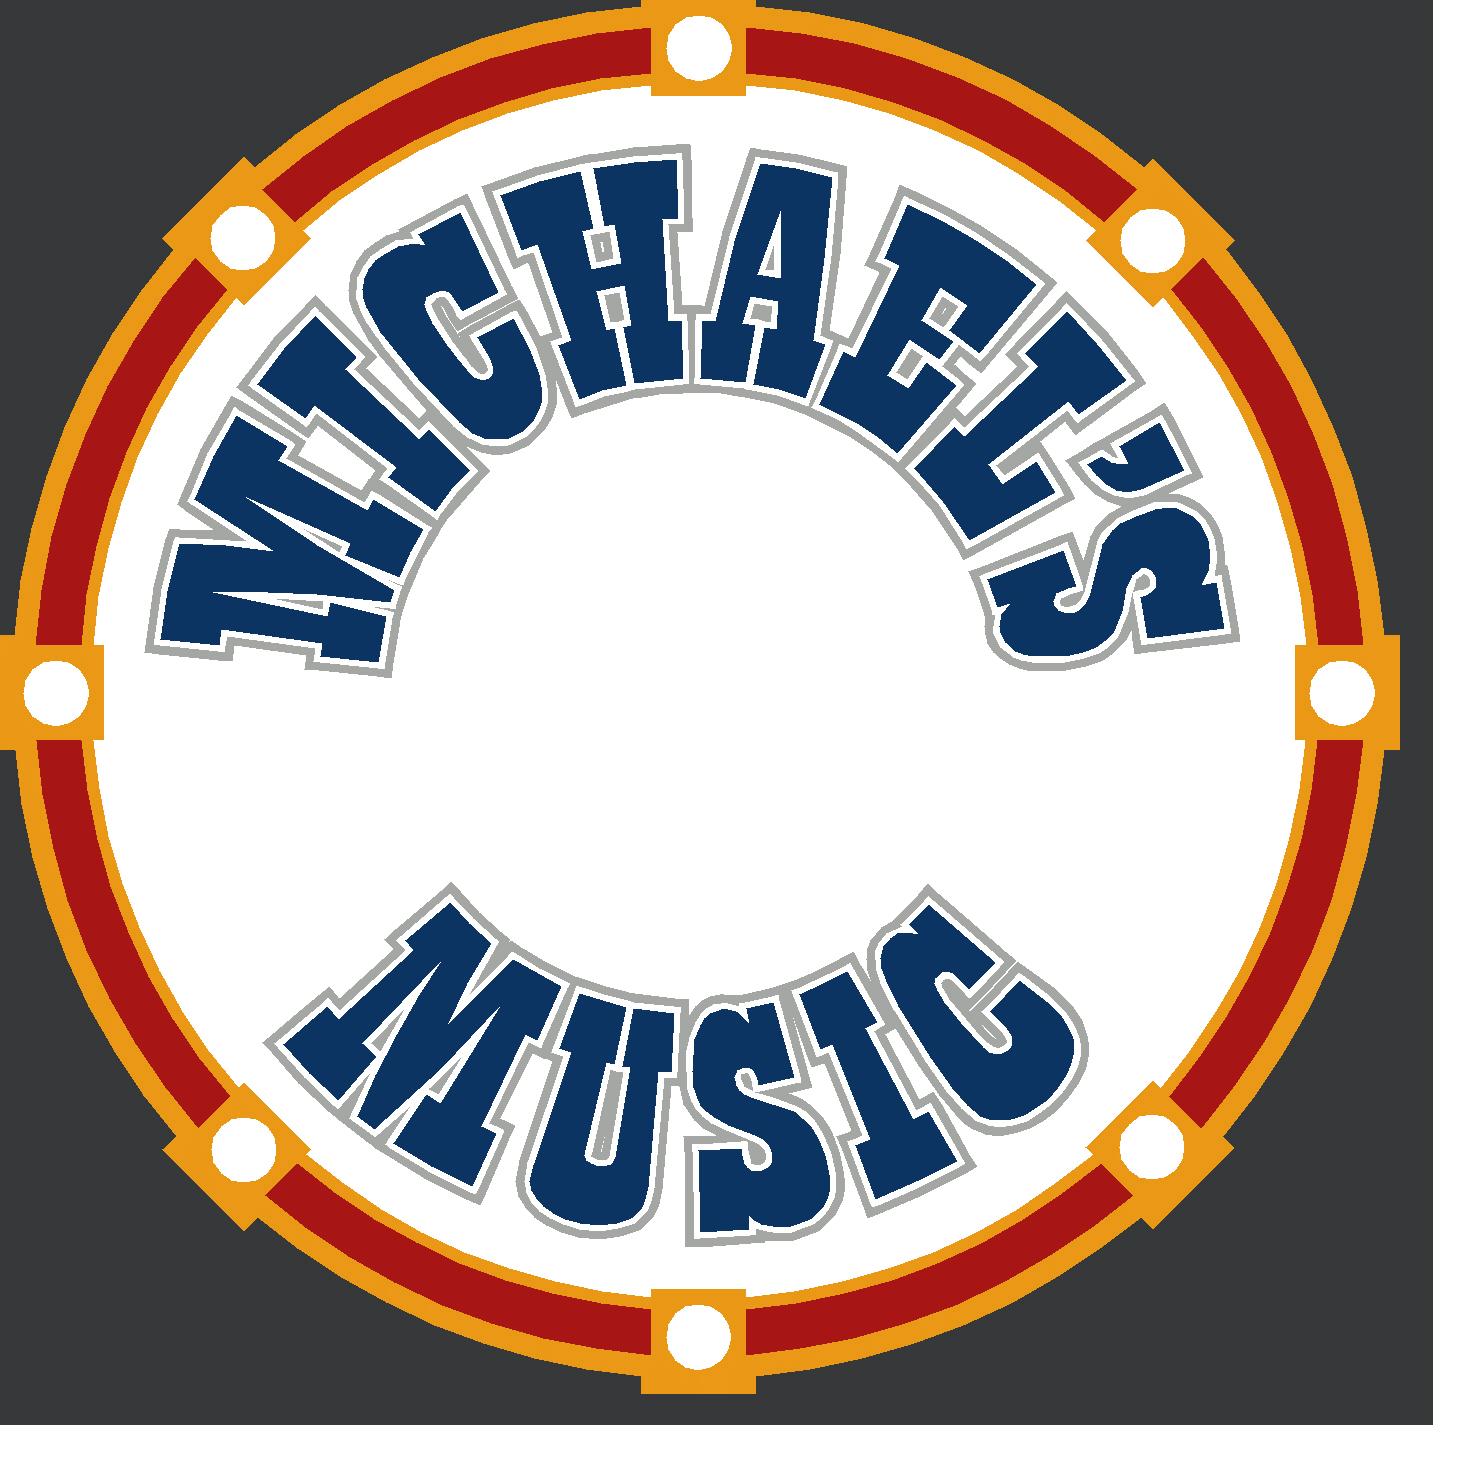 Michael's Music